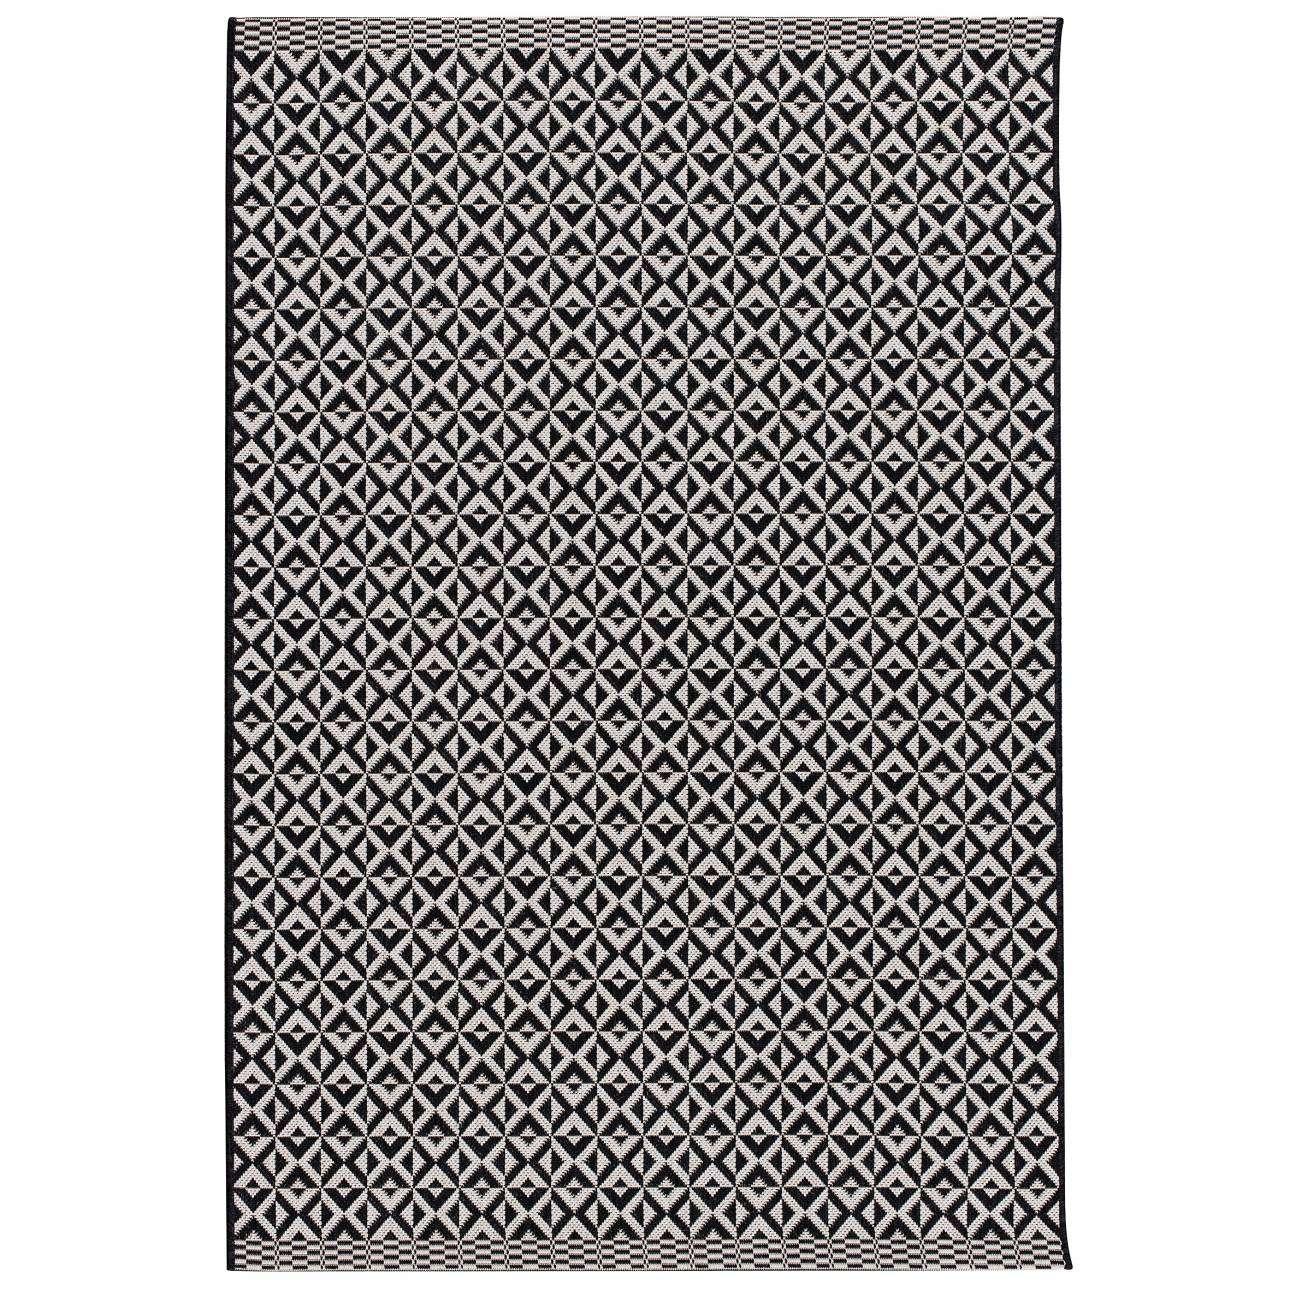 Teppich Modern Geometric black/ wool 160x230cm